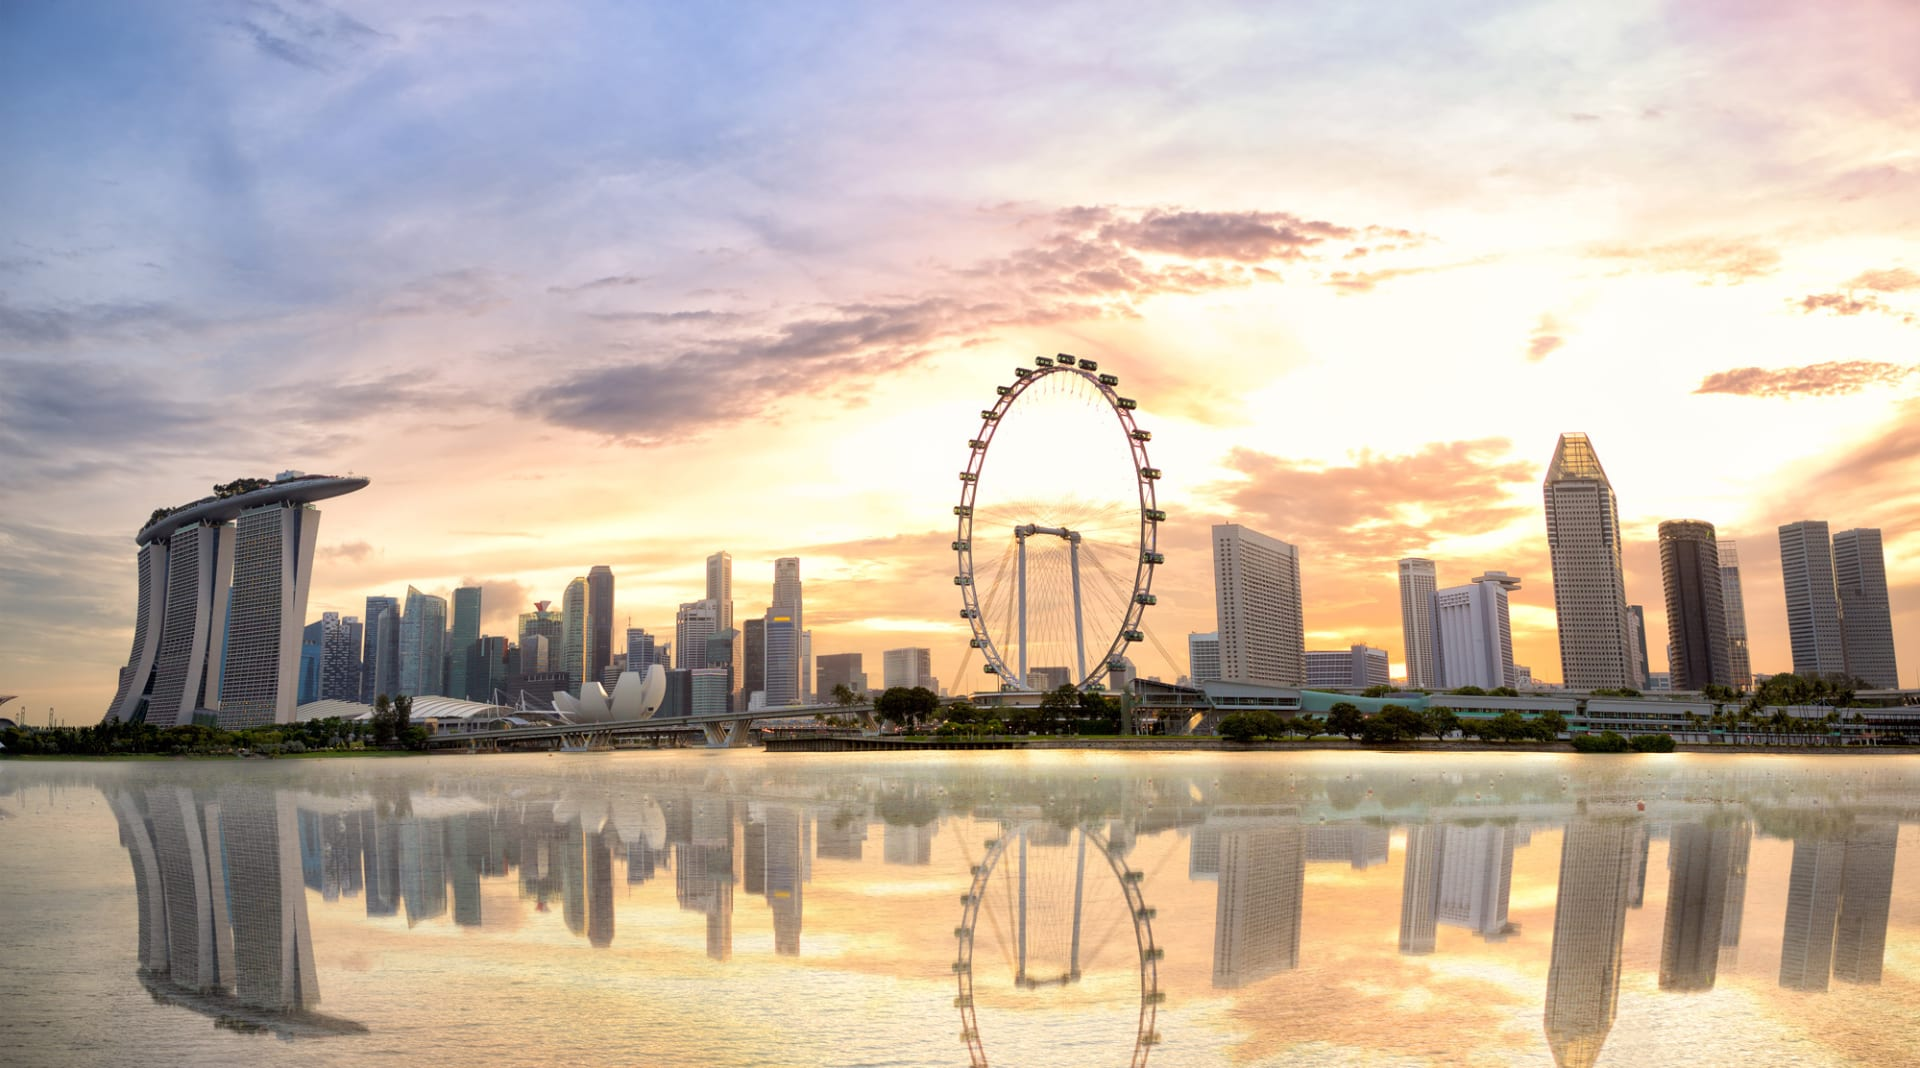 Singapore skyline at sunset CKLGWB9 low